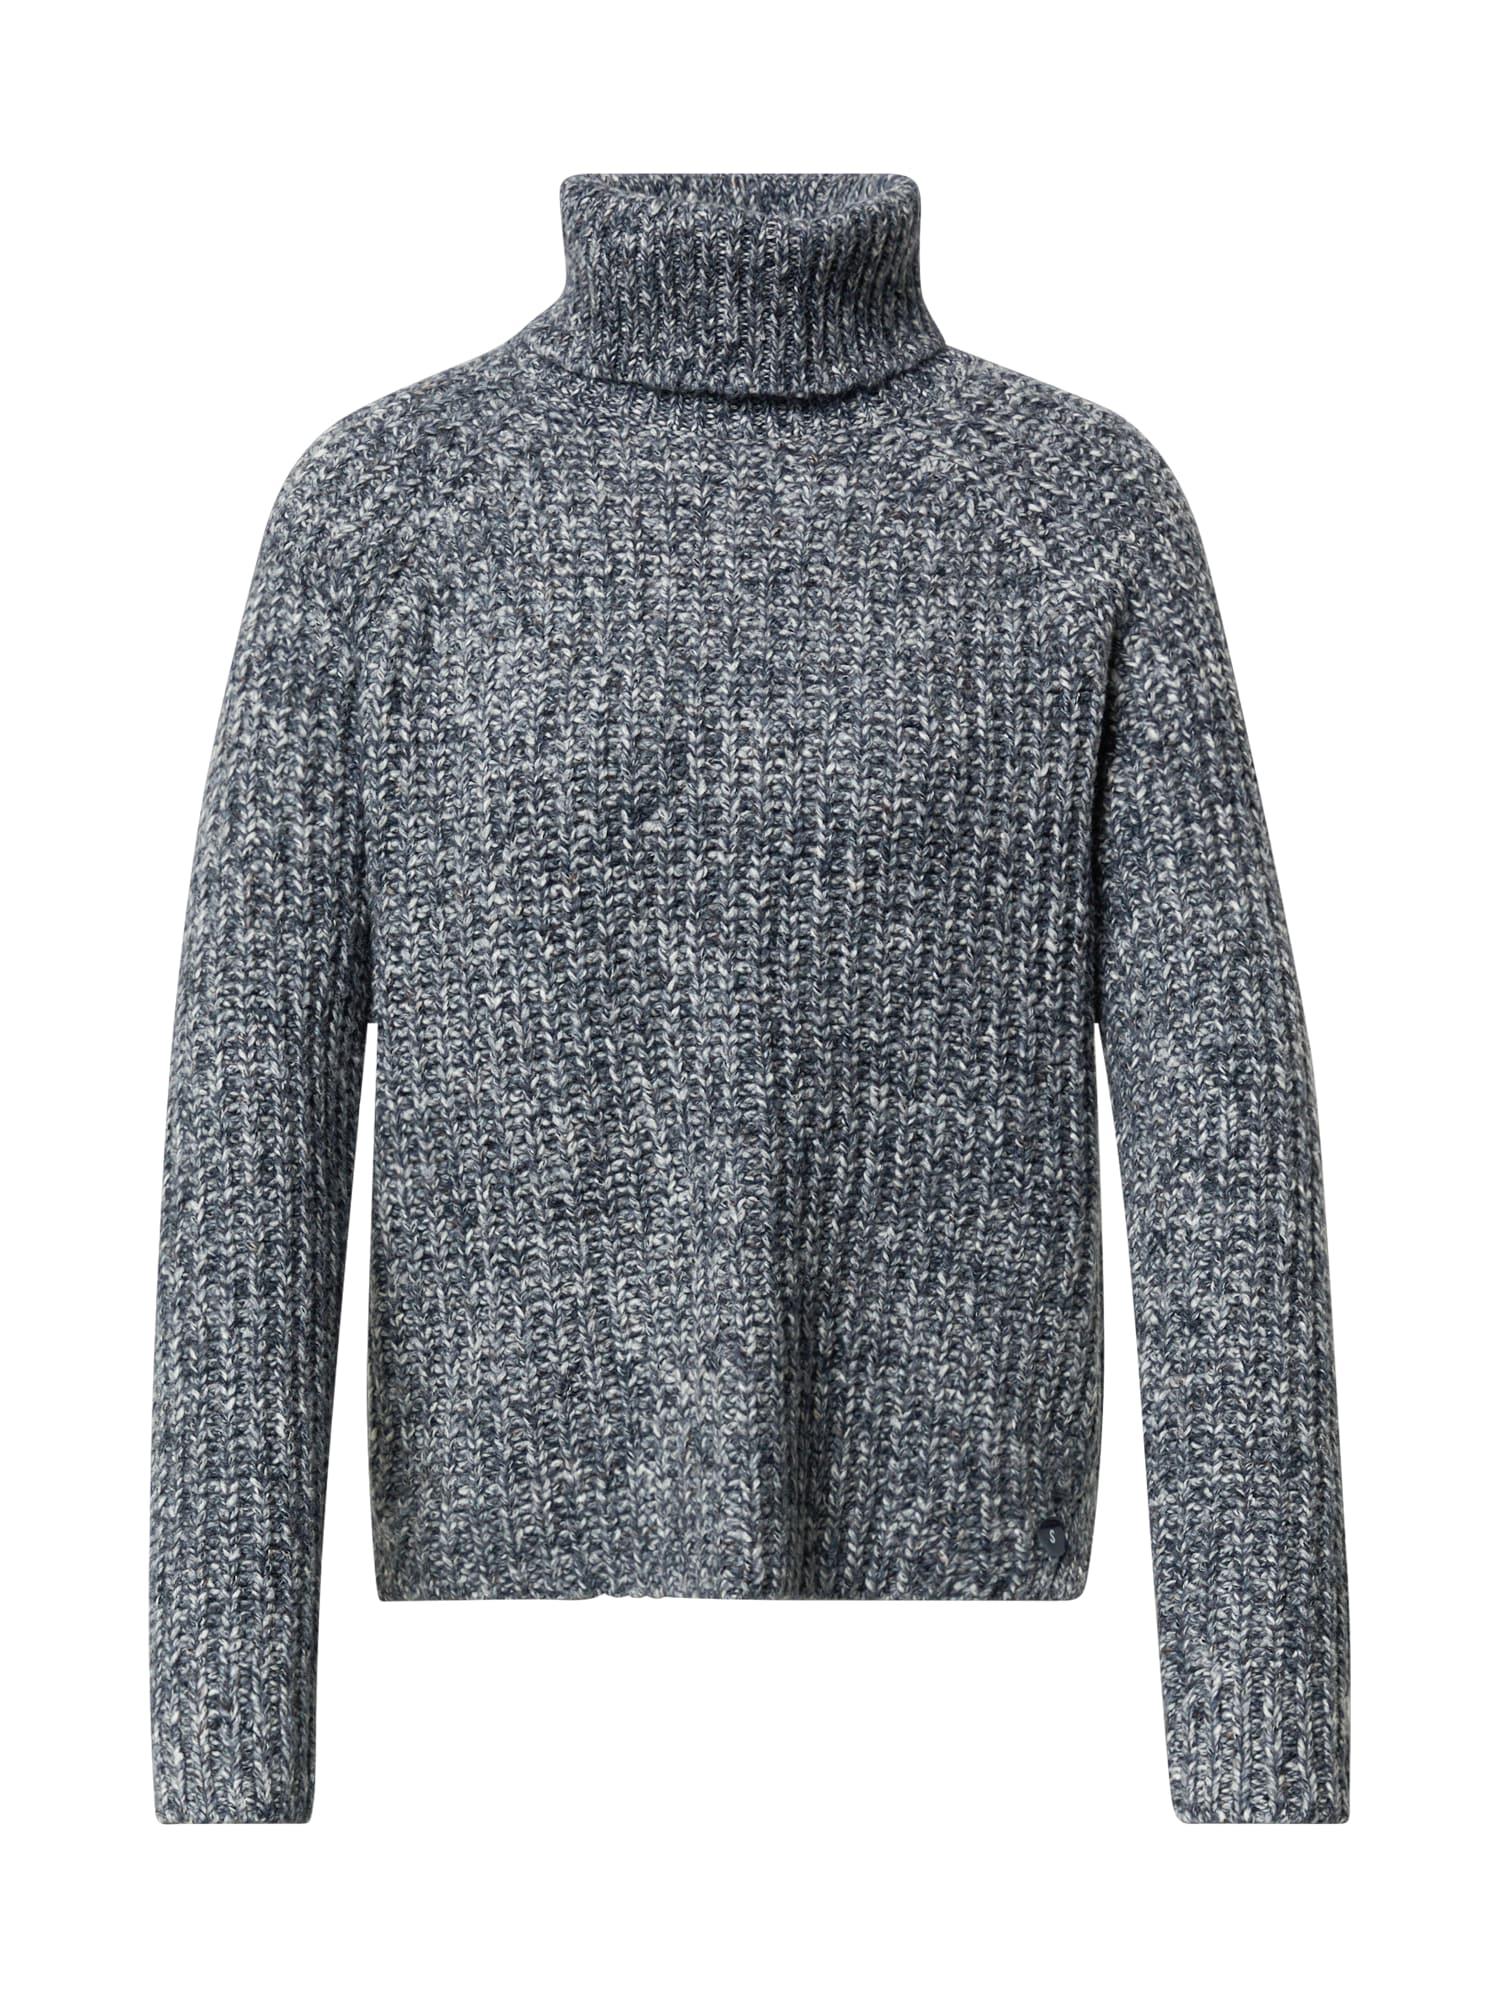 Abercrombie & Fitch Megztinis margai pilka